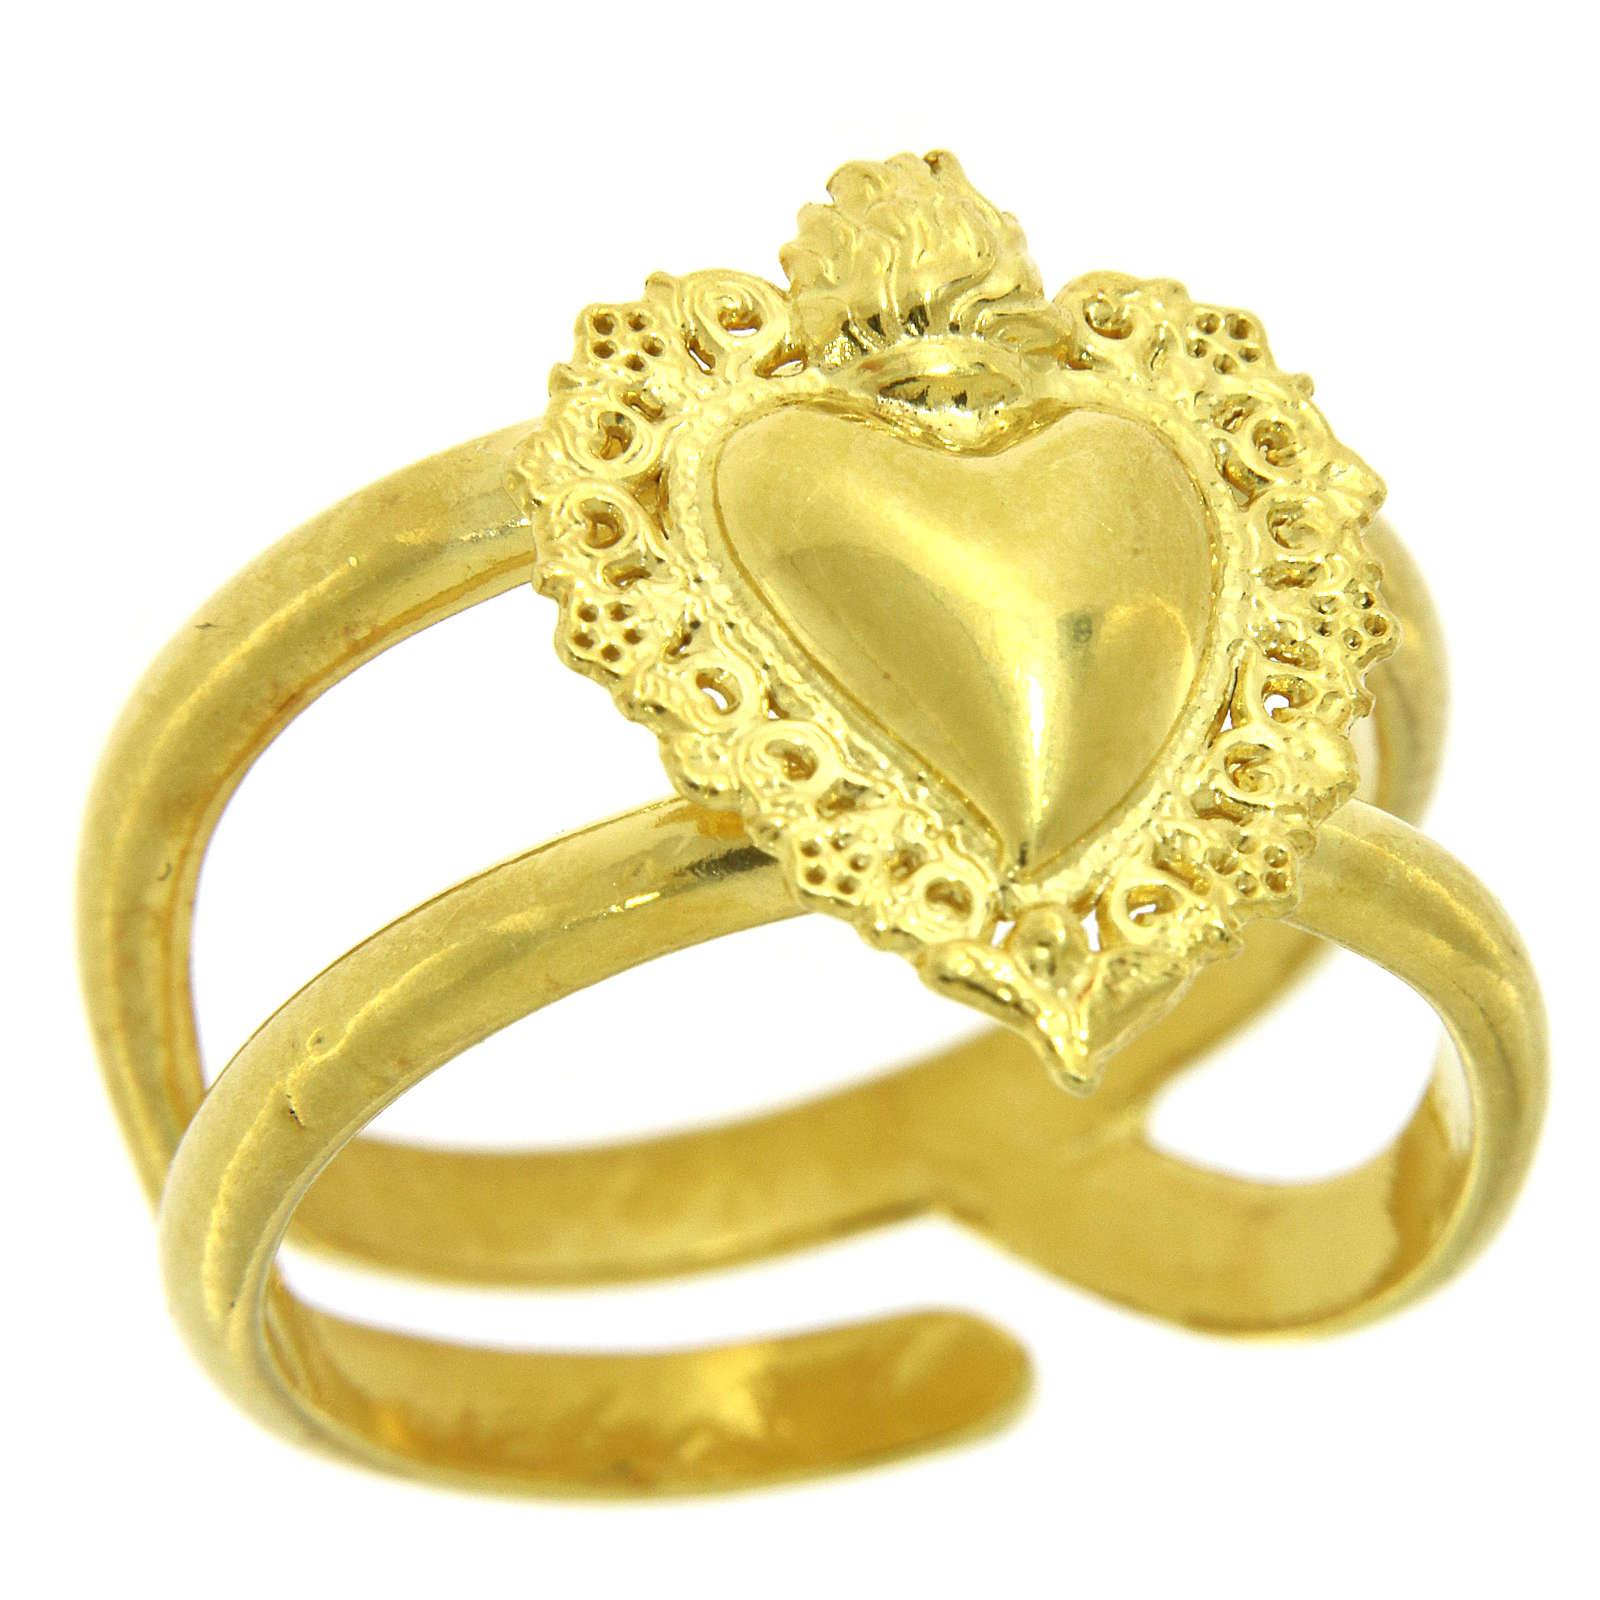 Ring Votivherz vergoldeten Silber 925 3